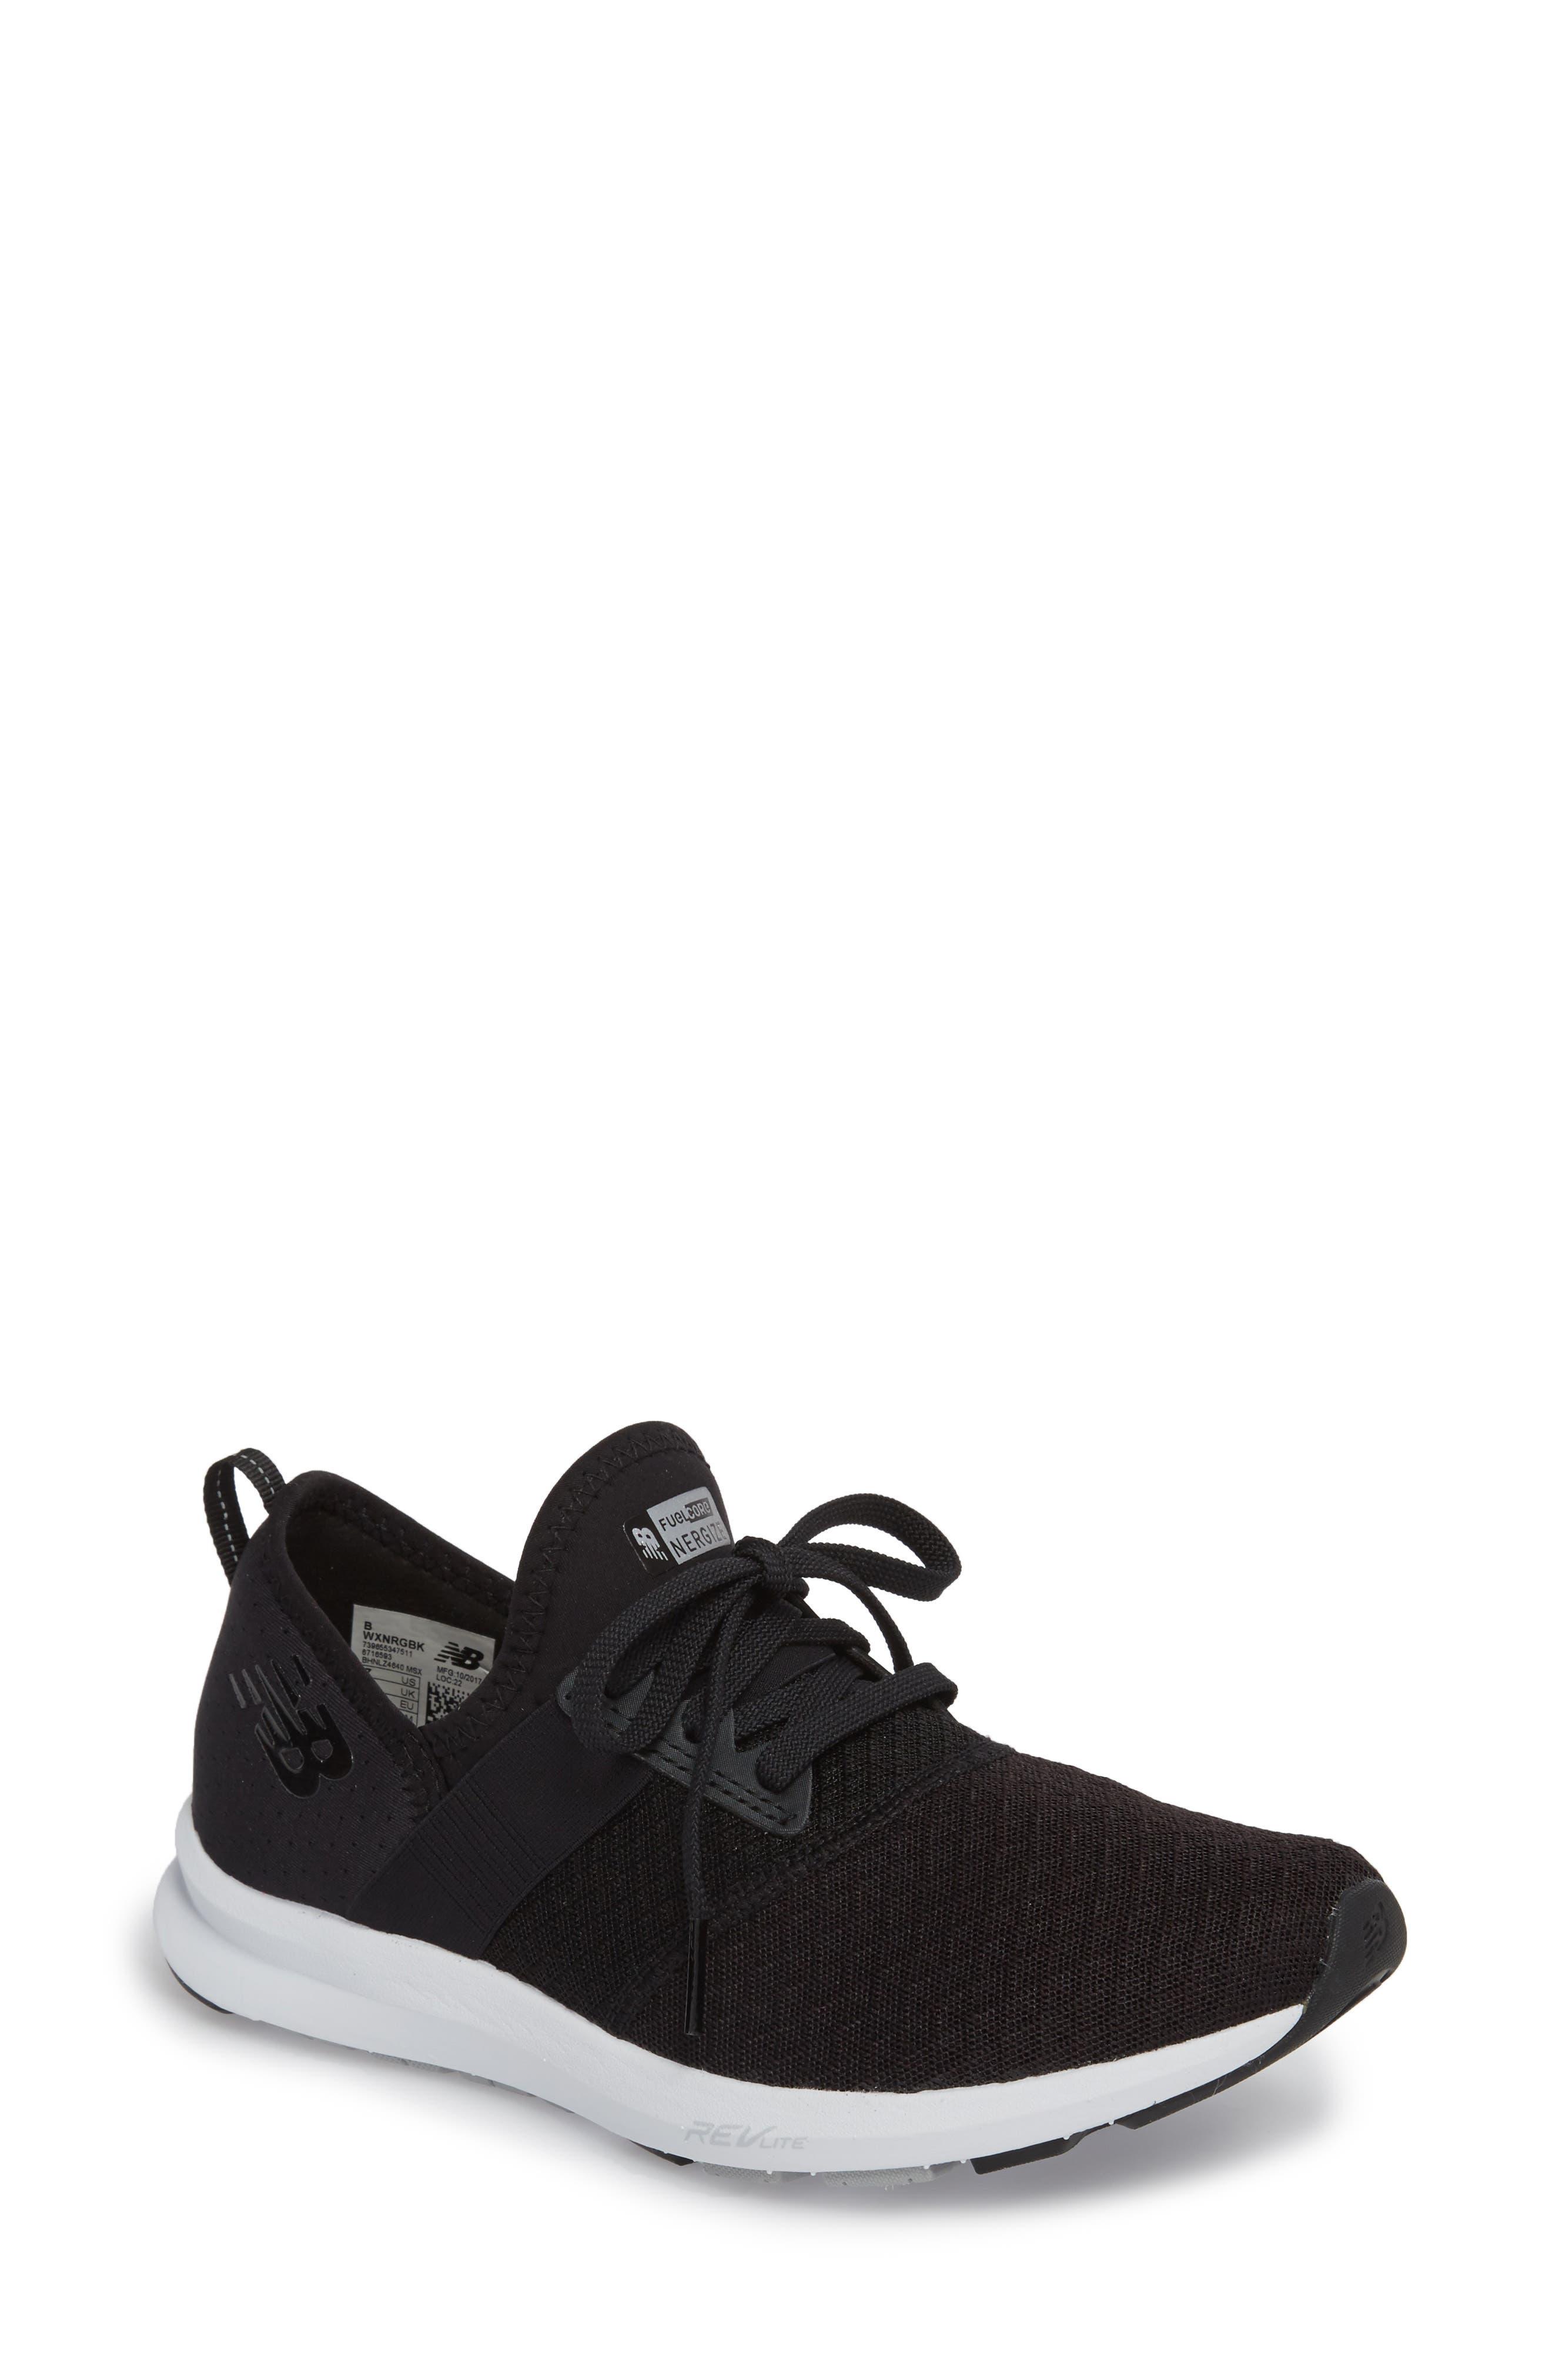 FuelCore NERGIZE Sneaker,                         Main,                         color, BLACK